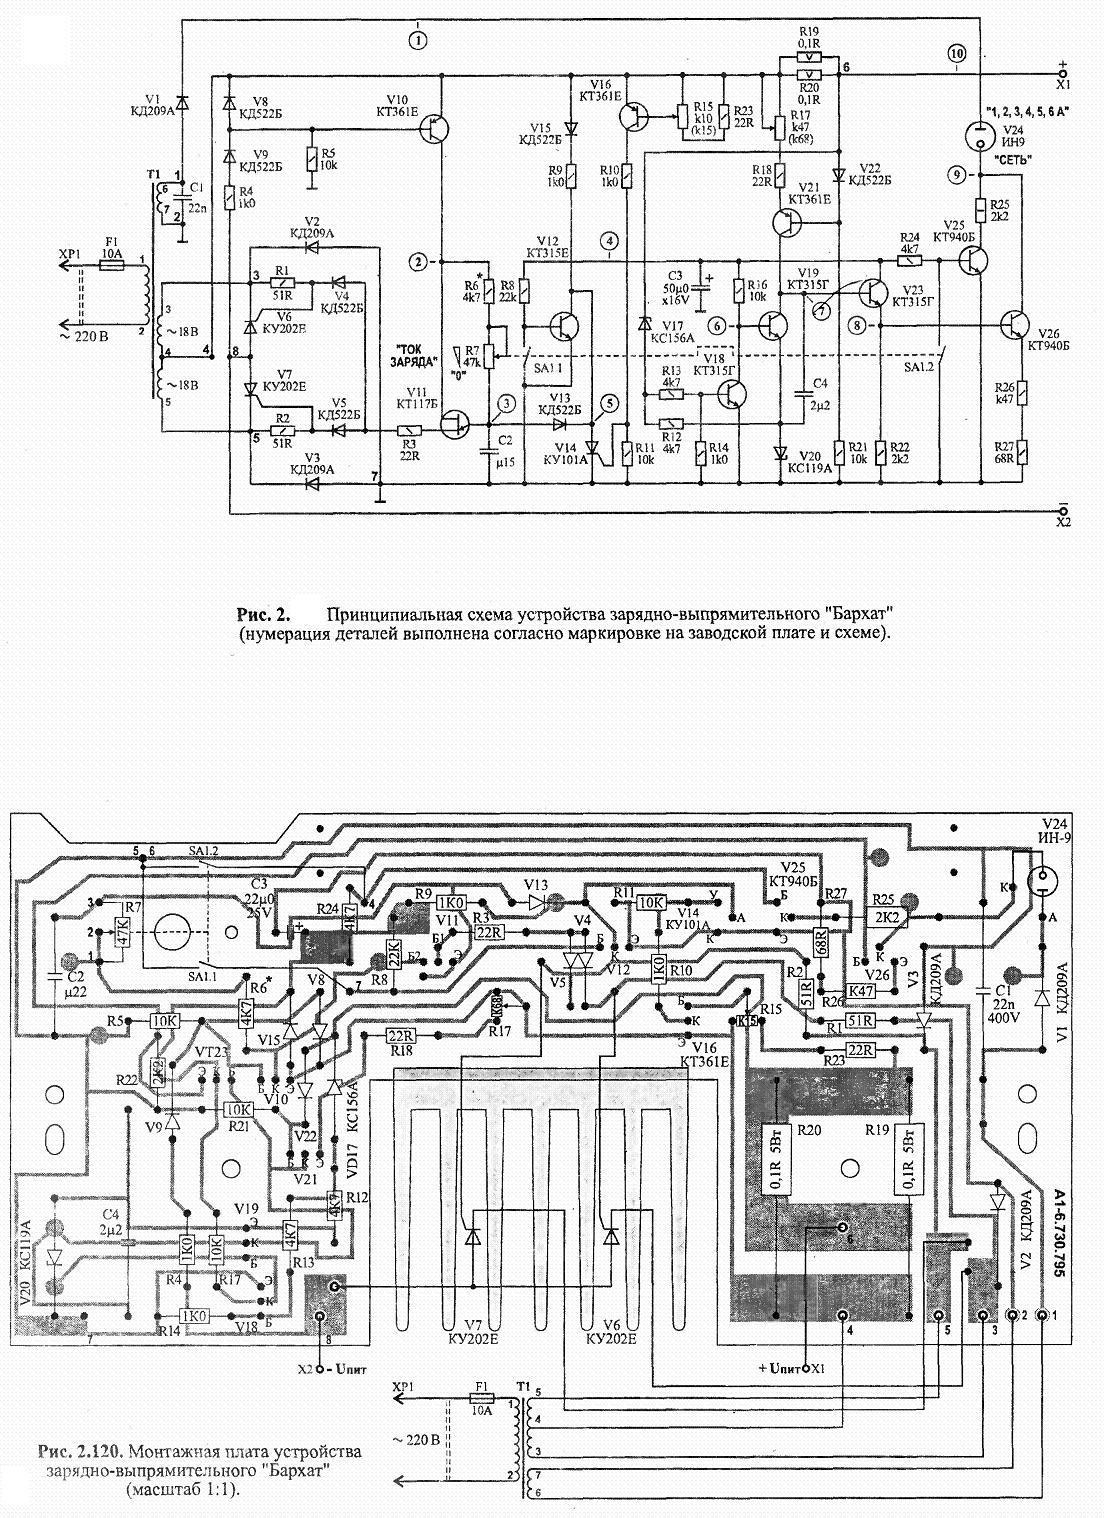 схема зарядки аккумуляторов б/п на кт117